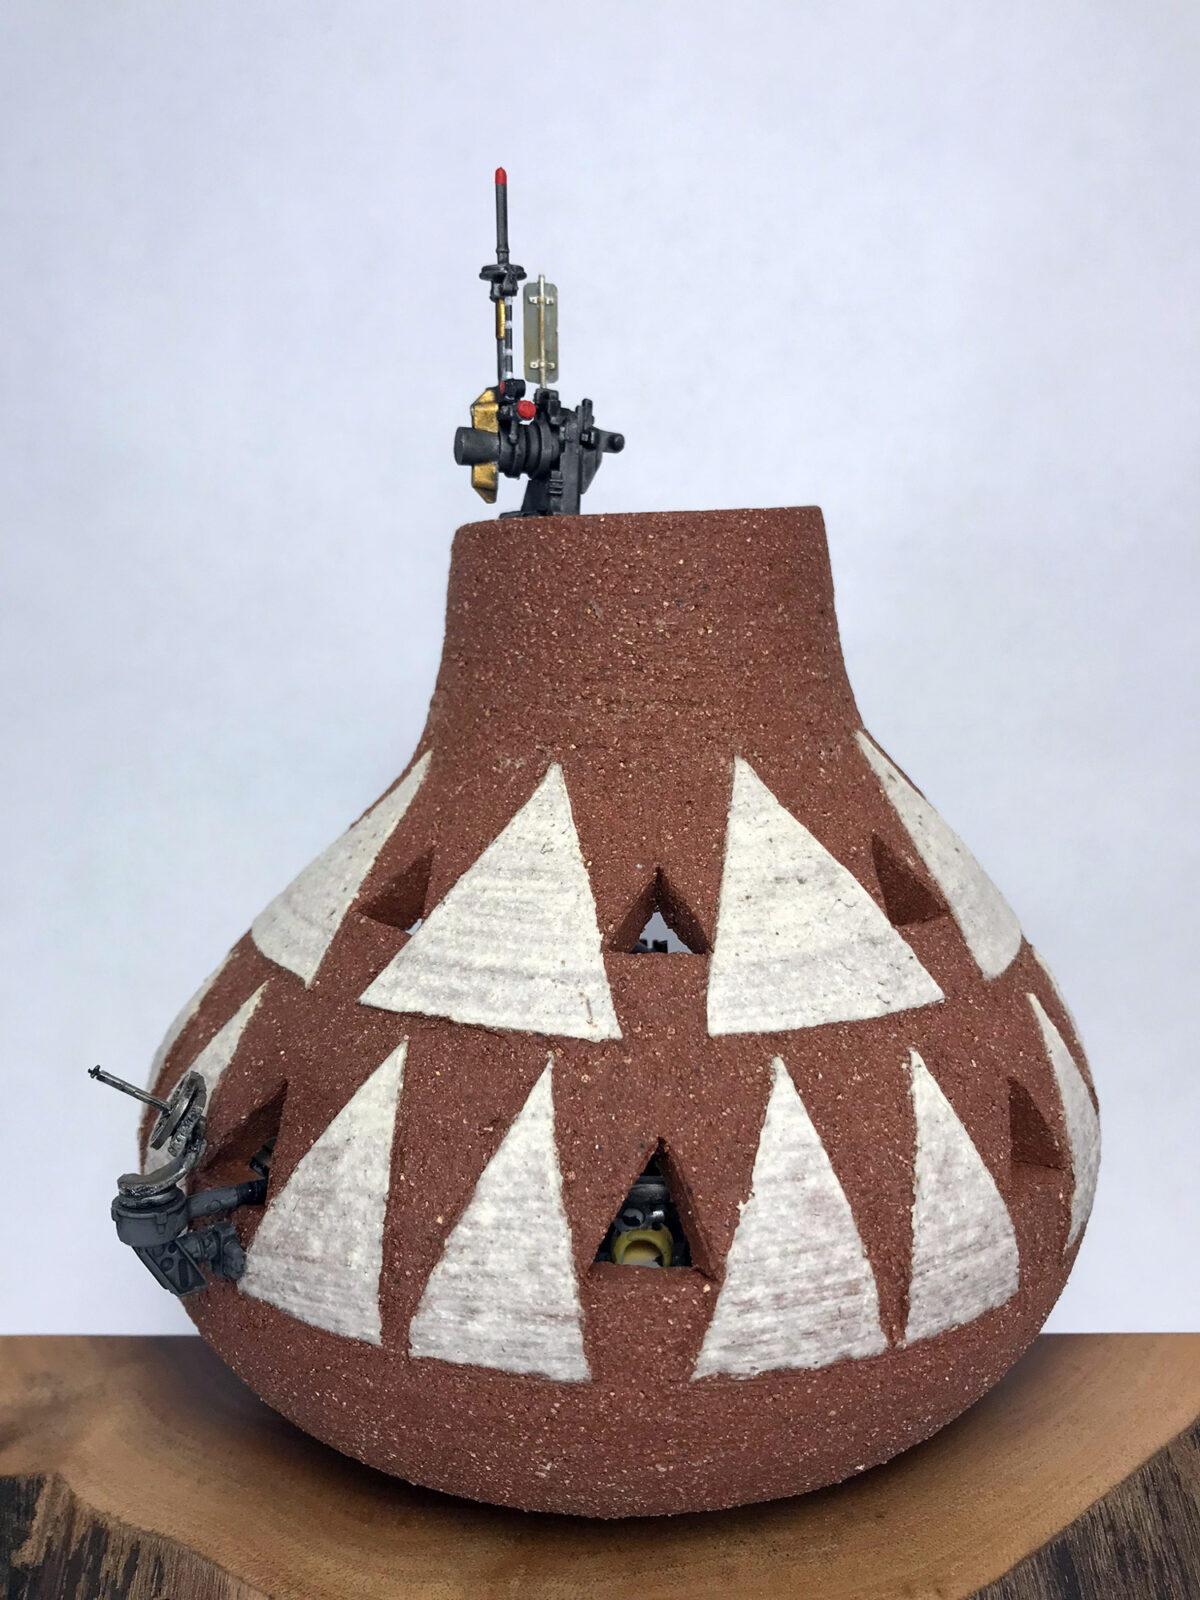 Miniature Workshops Constructed Inside Ceramic Vessels by Jedediah Voltz